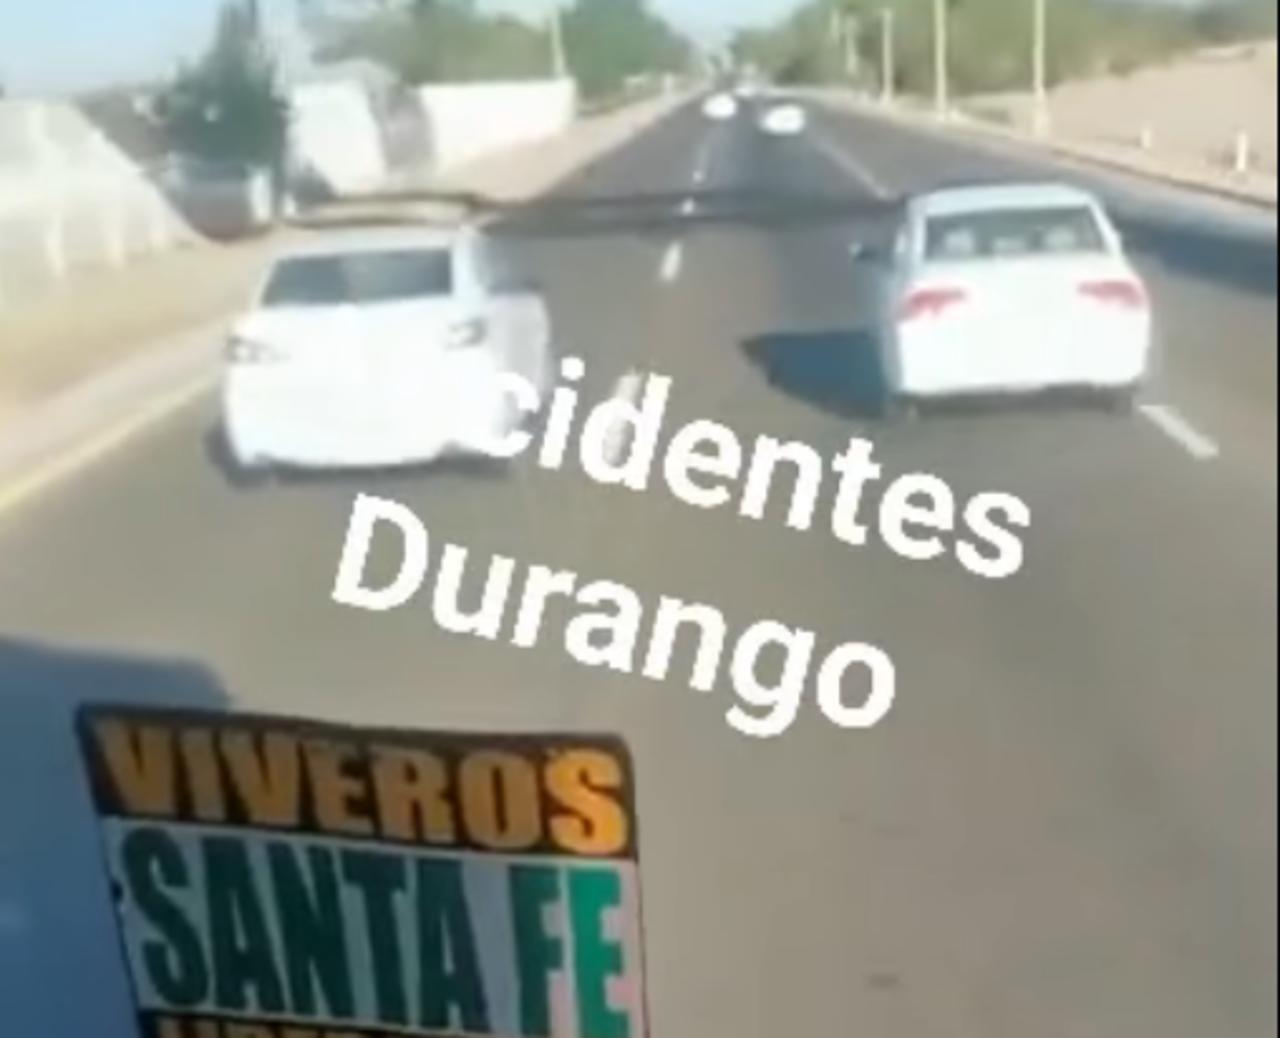 VIDEO: sujeto dispara contra camión de ruta tras discusión en Durango